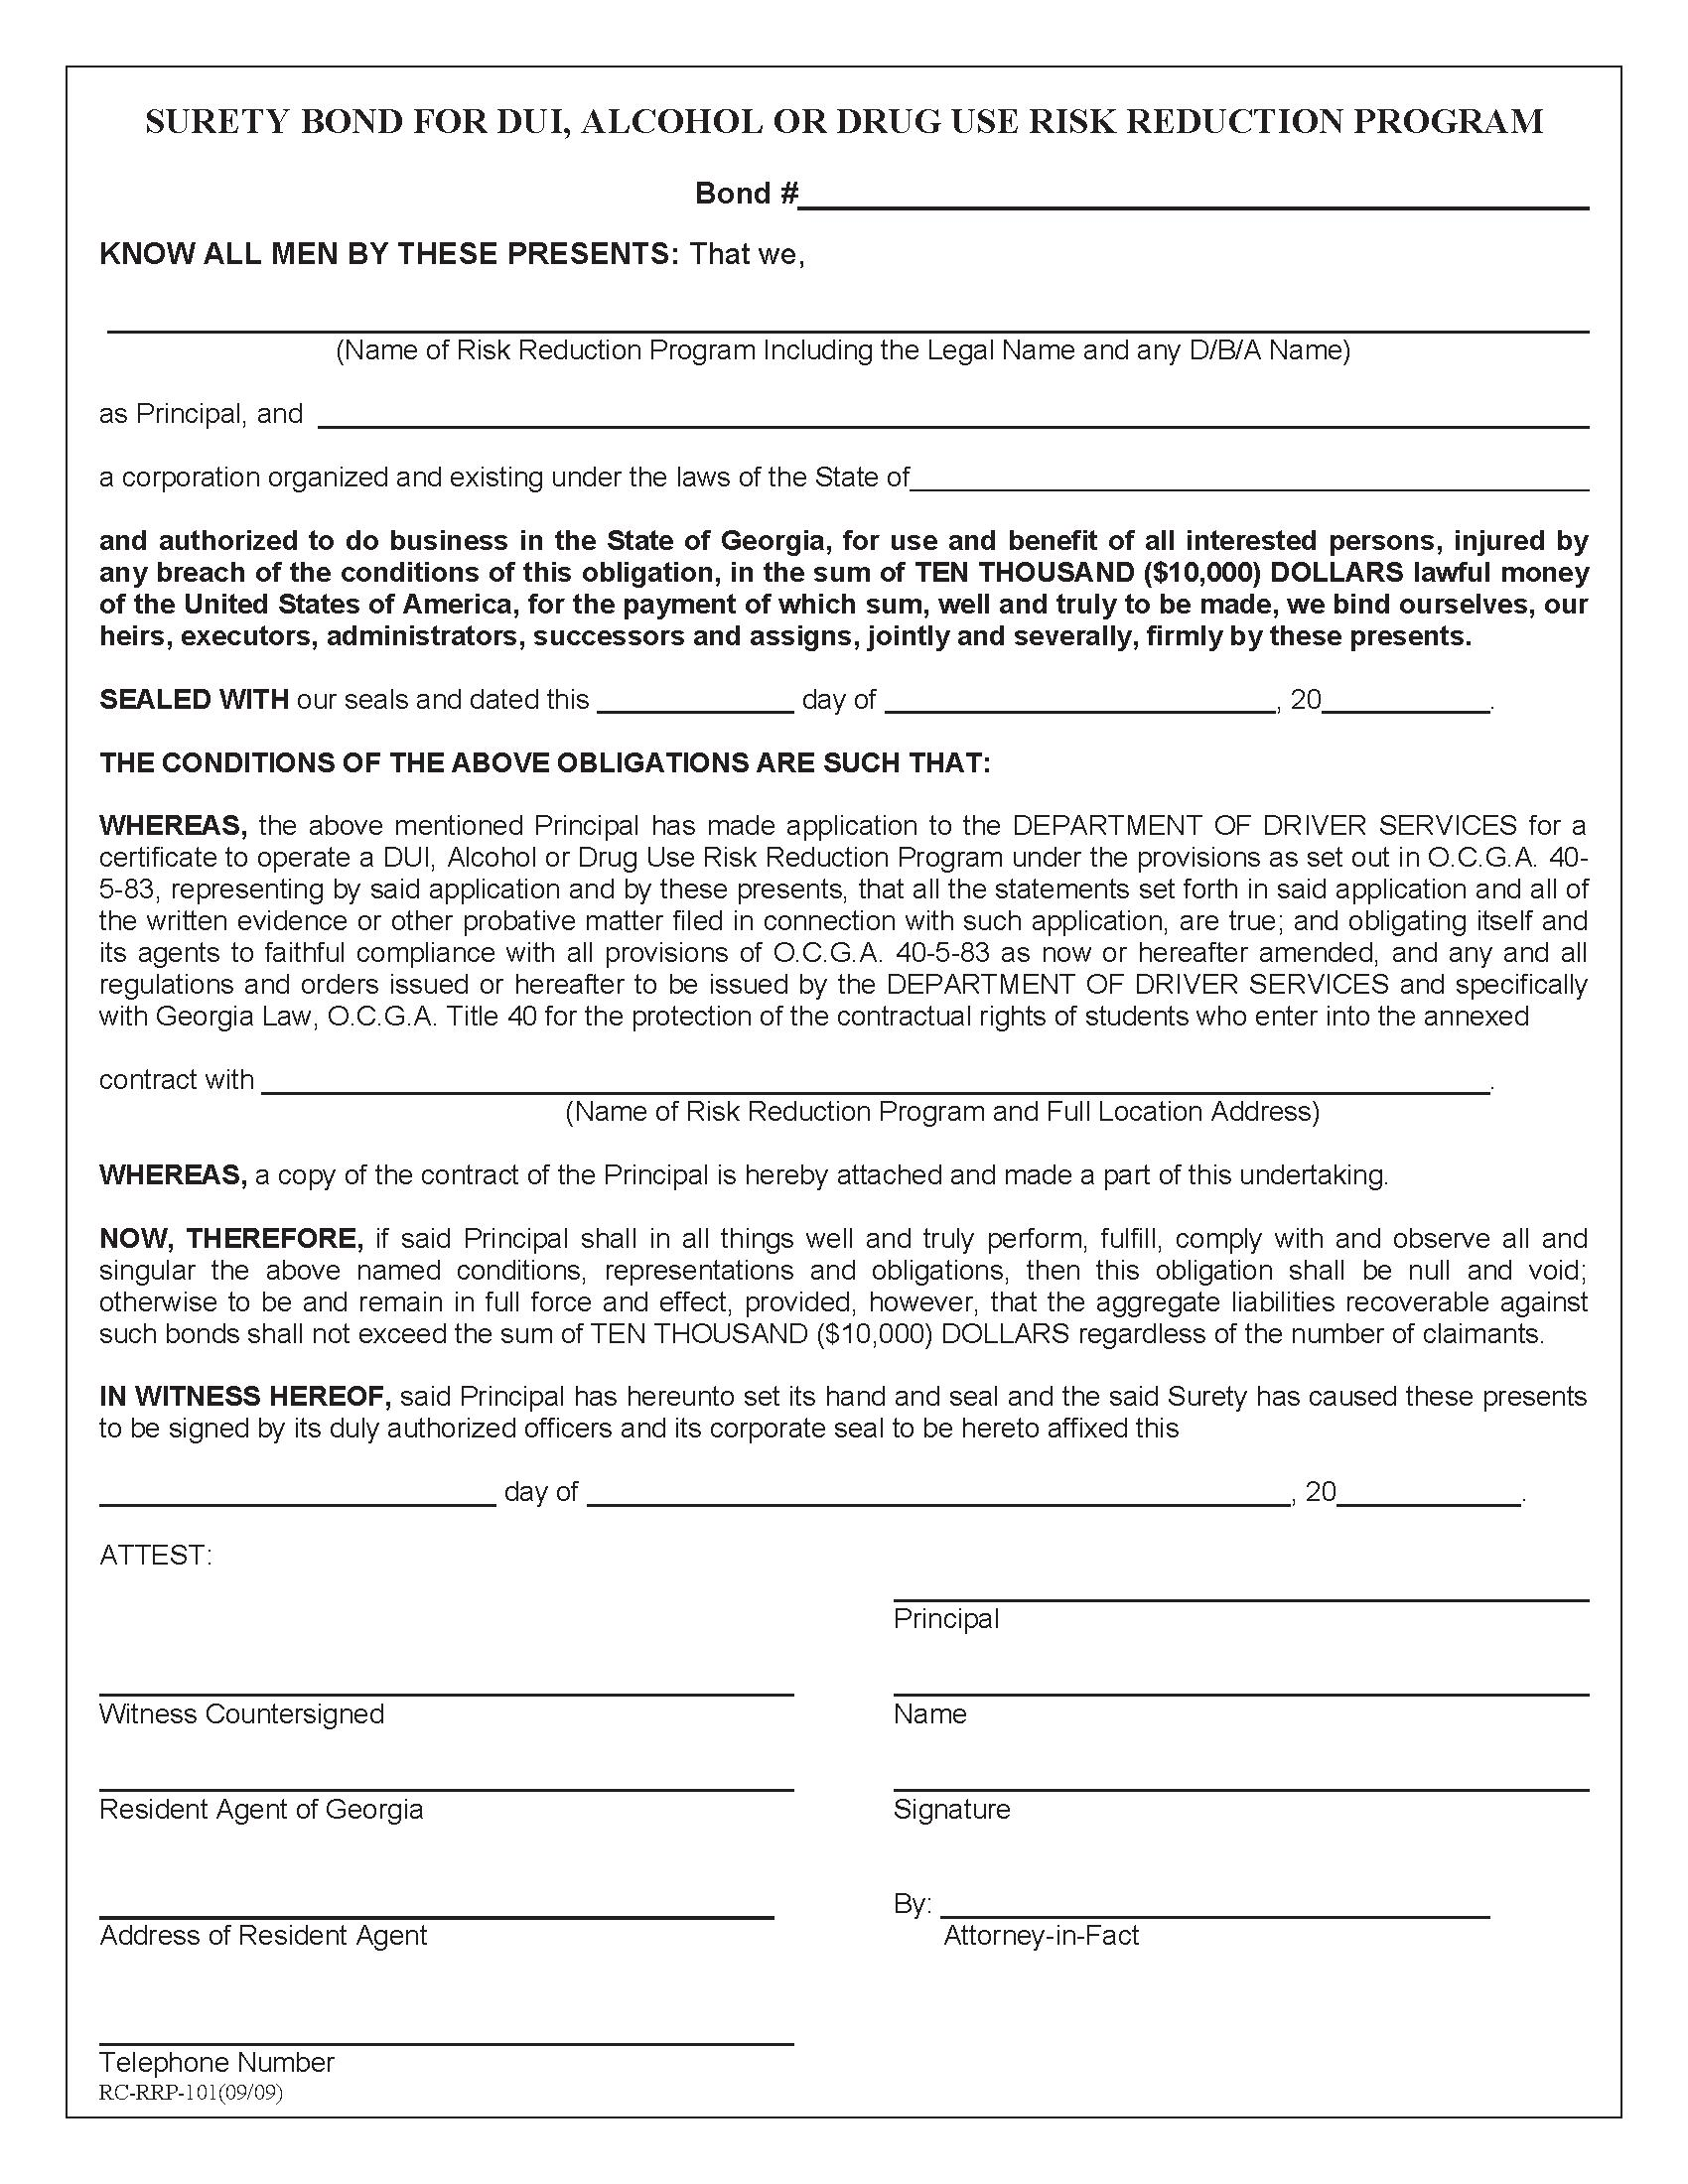 State of Georgia DUI Alcohol or Drug Use Risk Reduction Program sample image